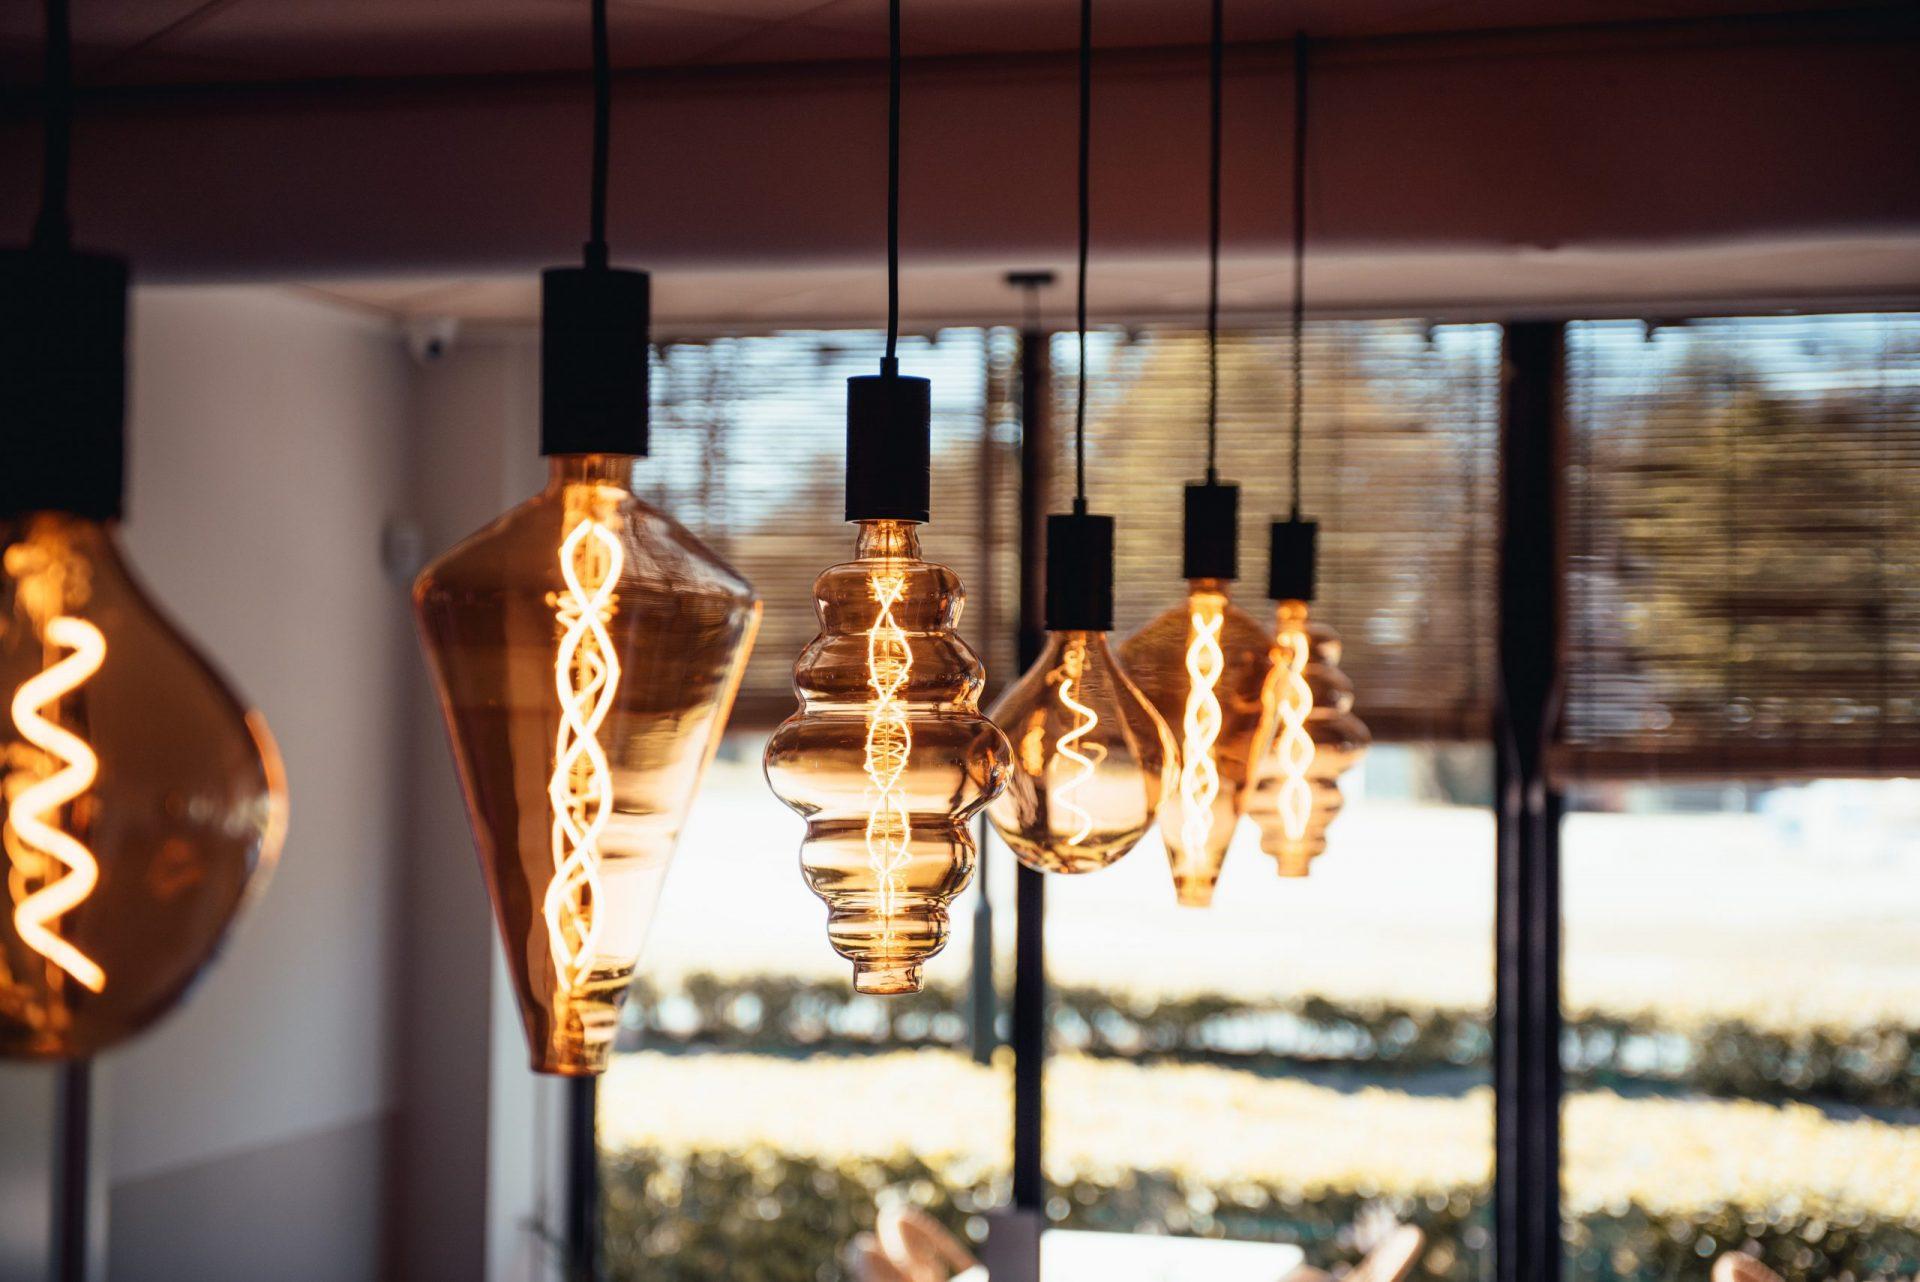 lampen, lampjesfabriek, lamp, sfeerverlichting, sfeer, interieur, licht, verlichting, LED, huiskamer, gezellig, gezelligheid, woonkamer, xmariekie